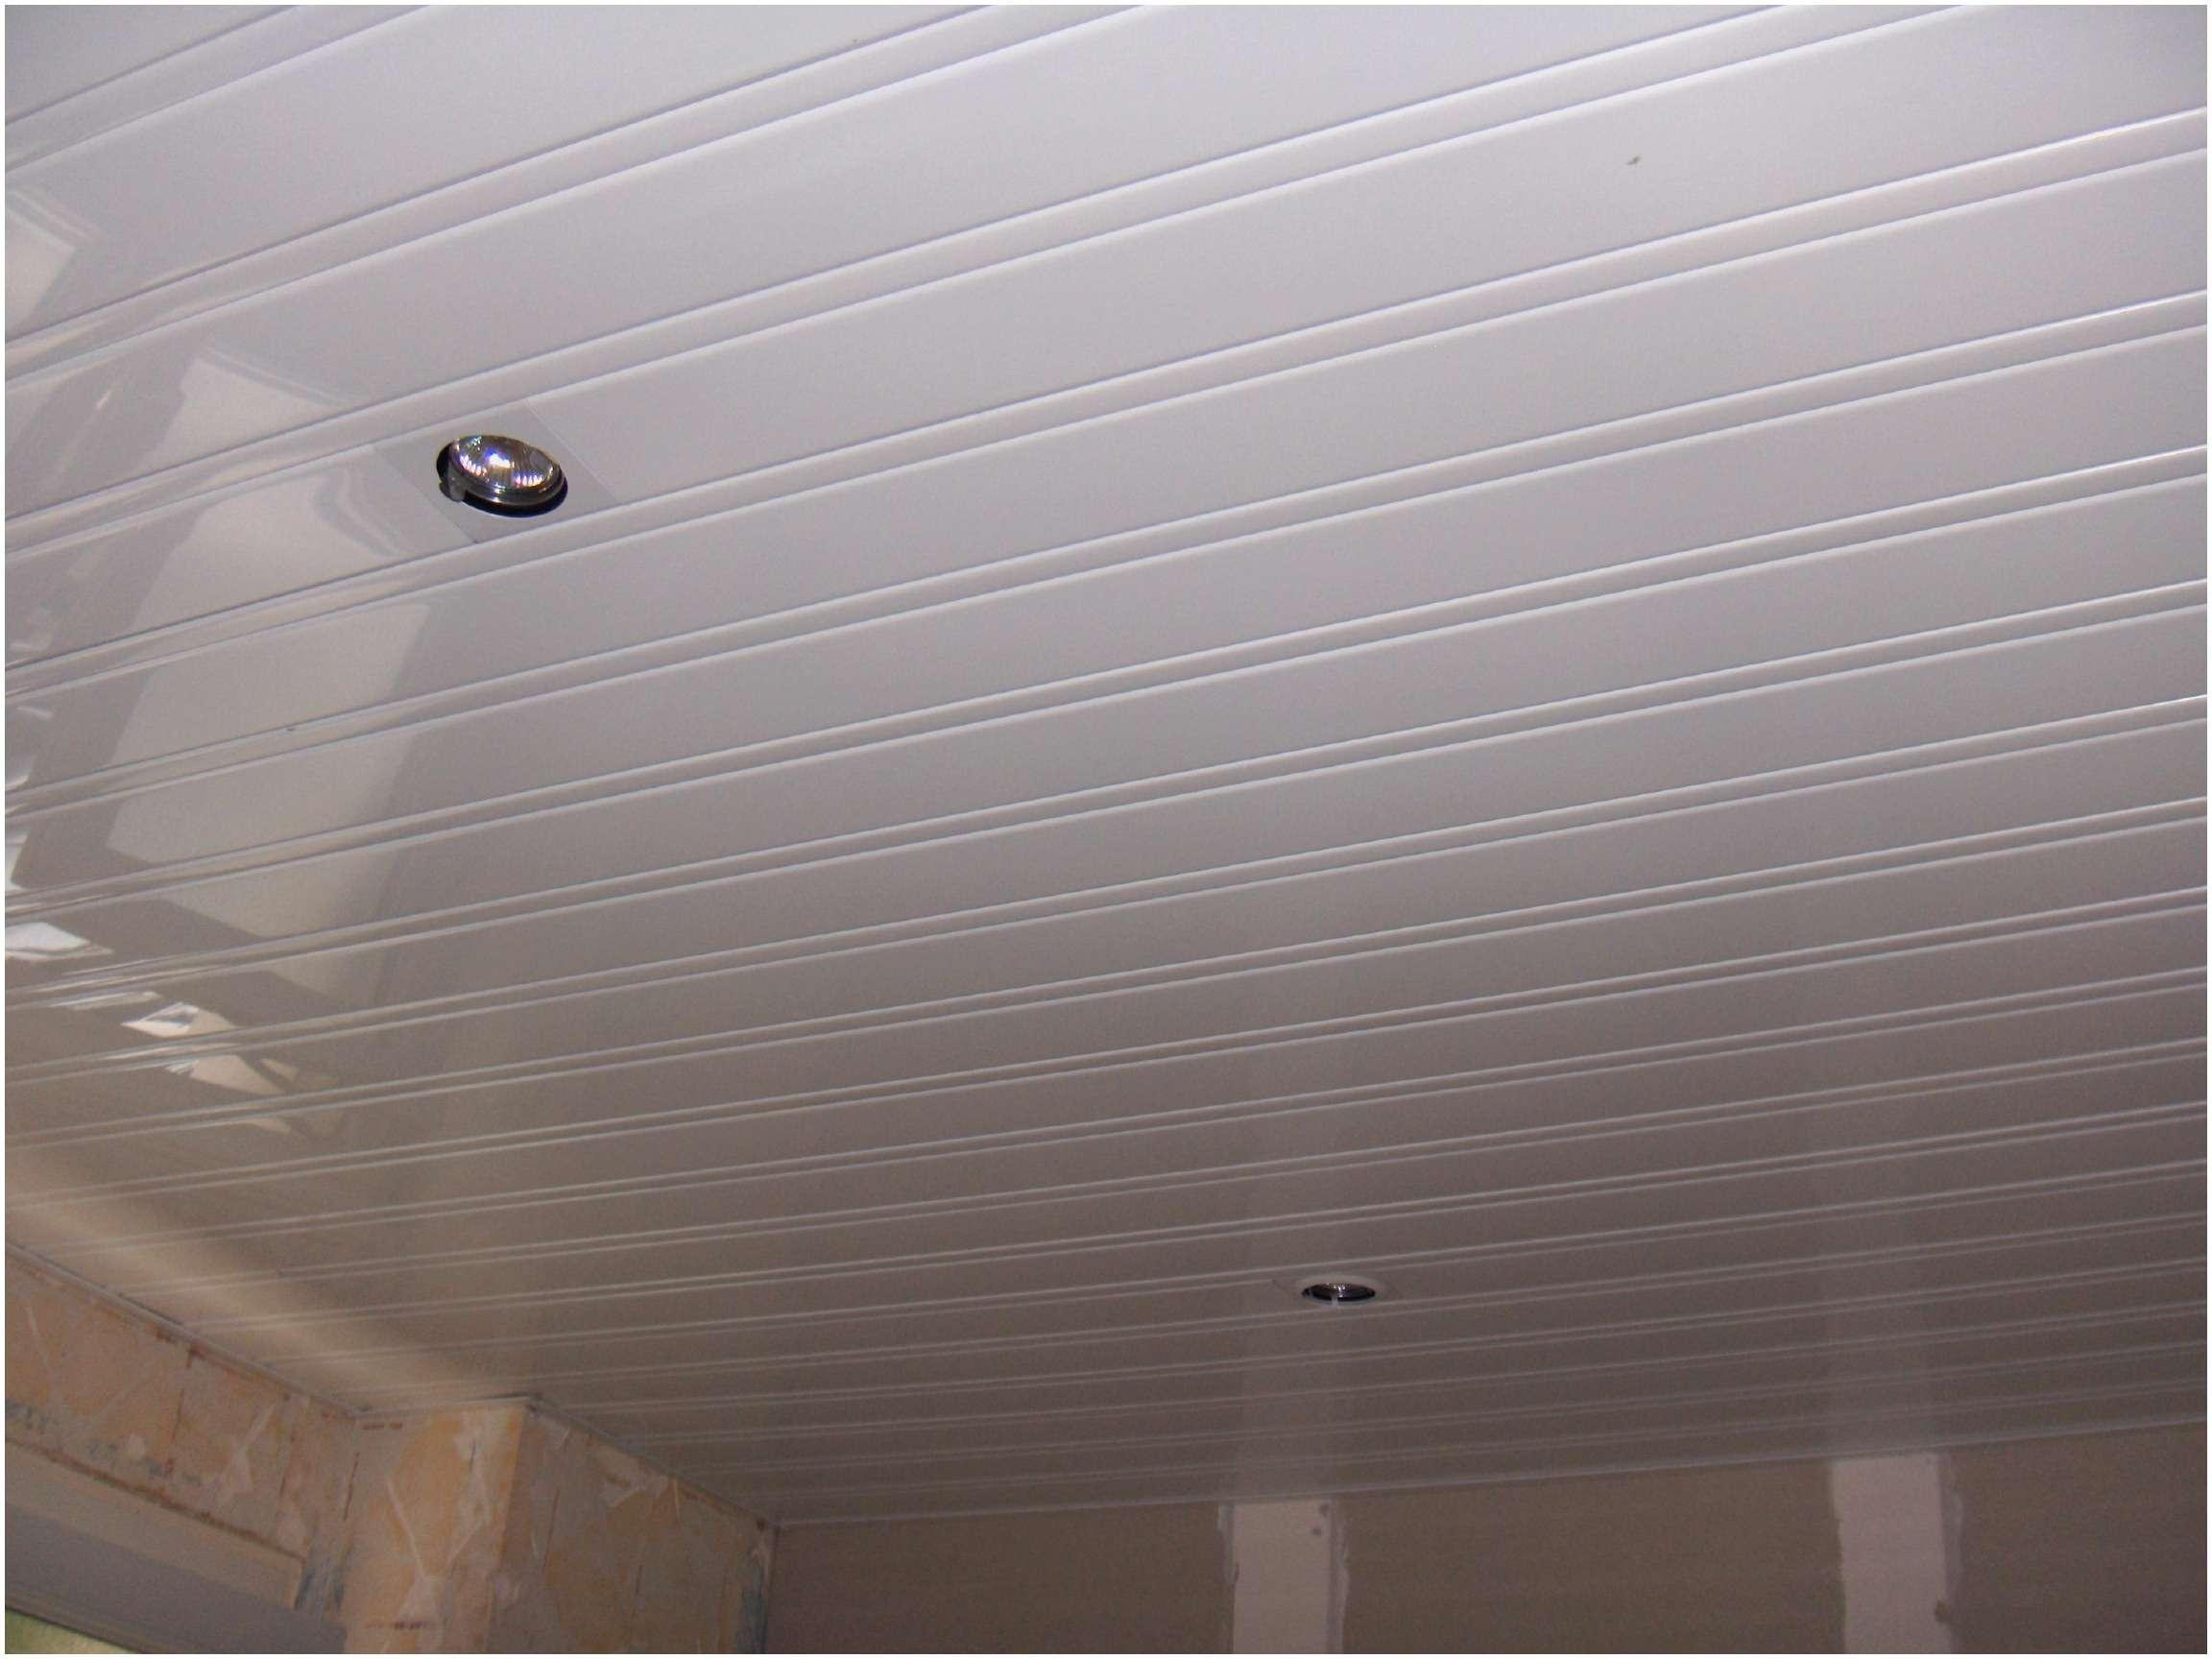 Dalle Faux Plafond 60×60 Brico Depot – Gamboahinestrosa concernant Dalle Faux Plafond 60X60 Brico Dépôt